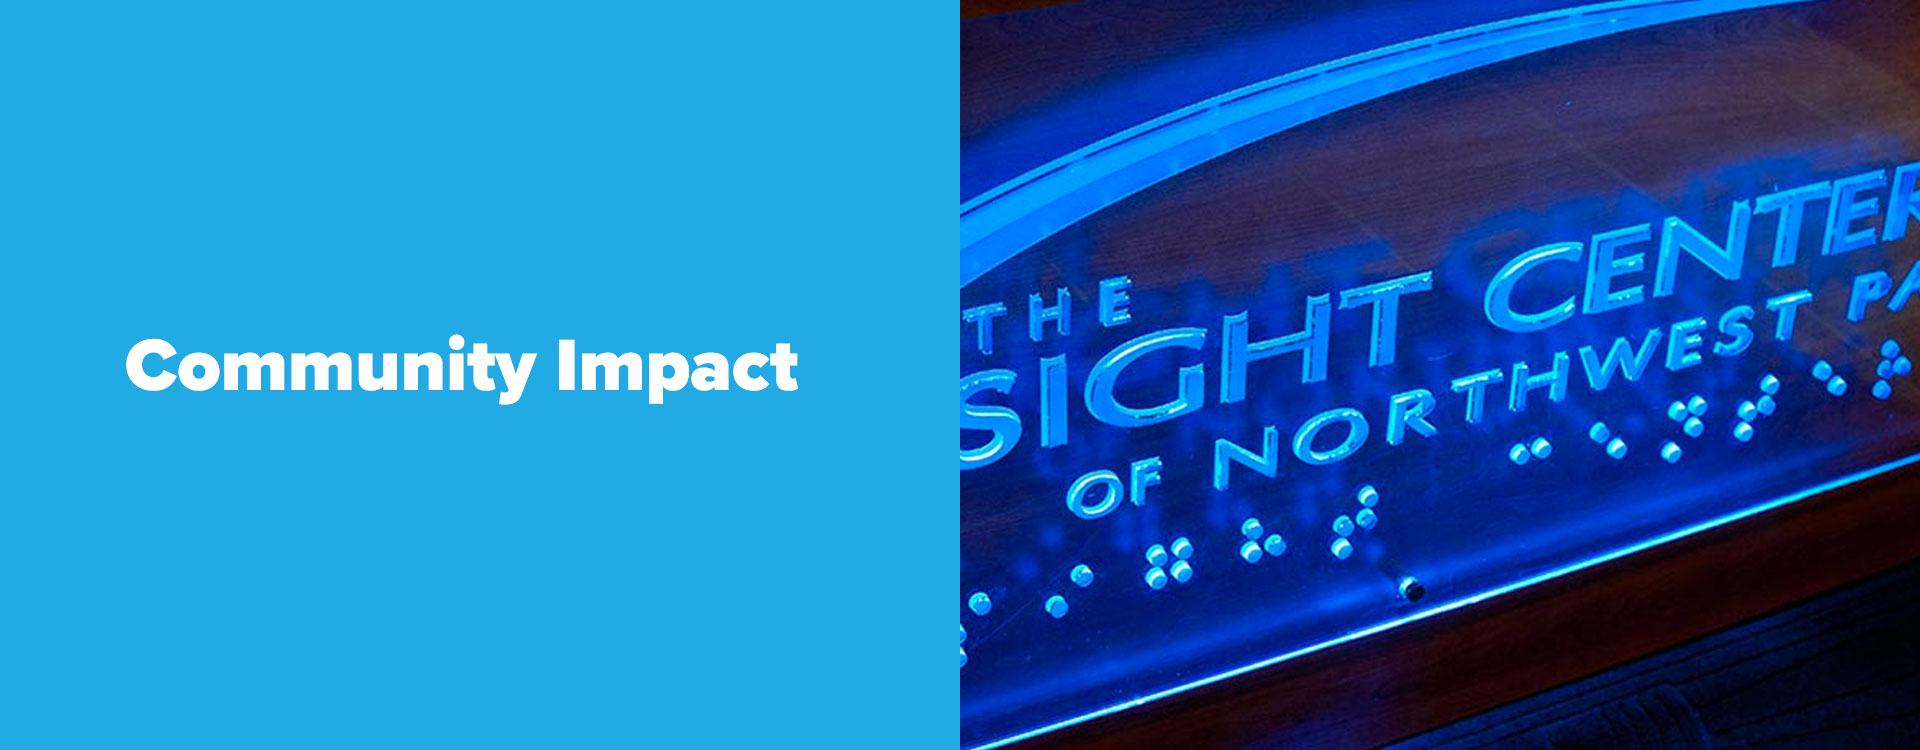 community-impact